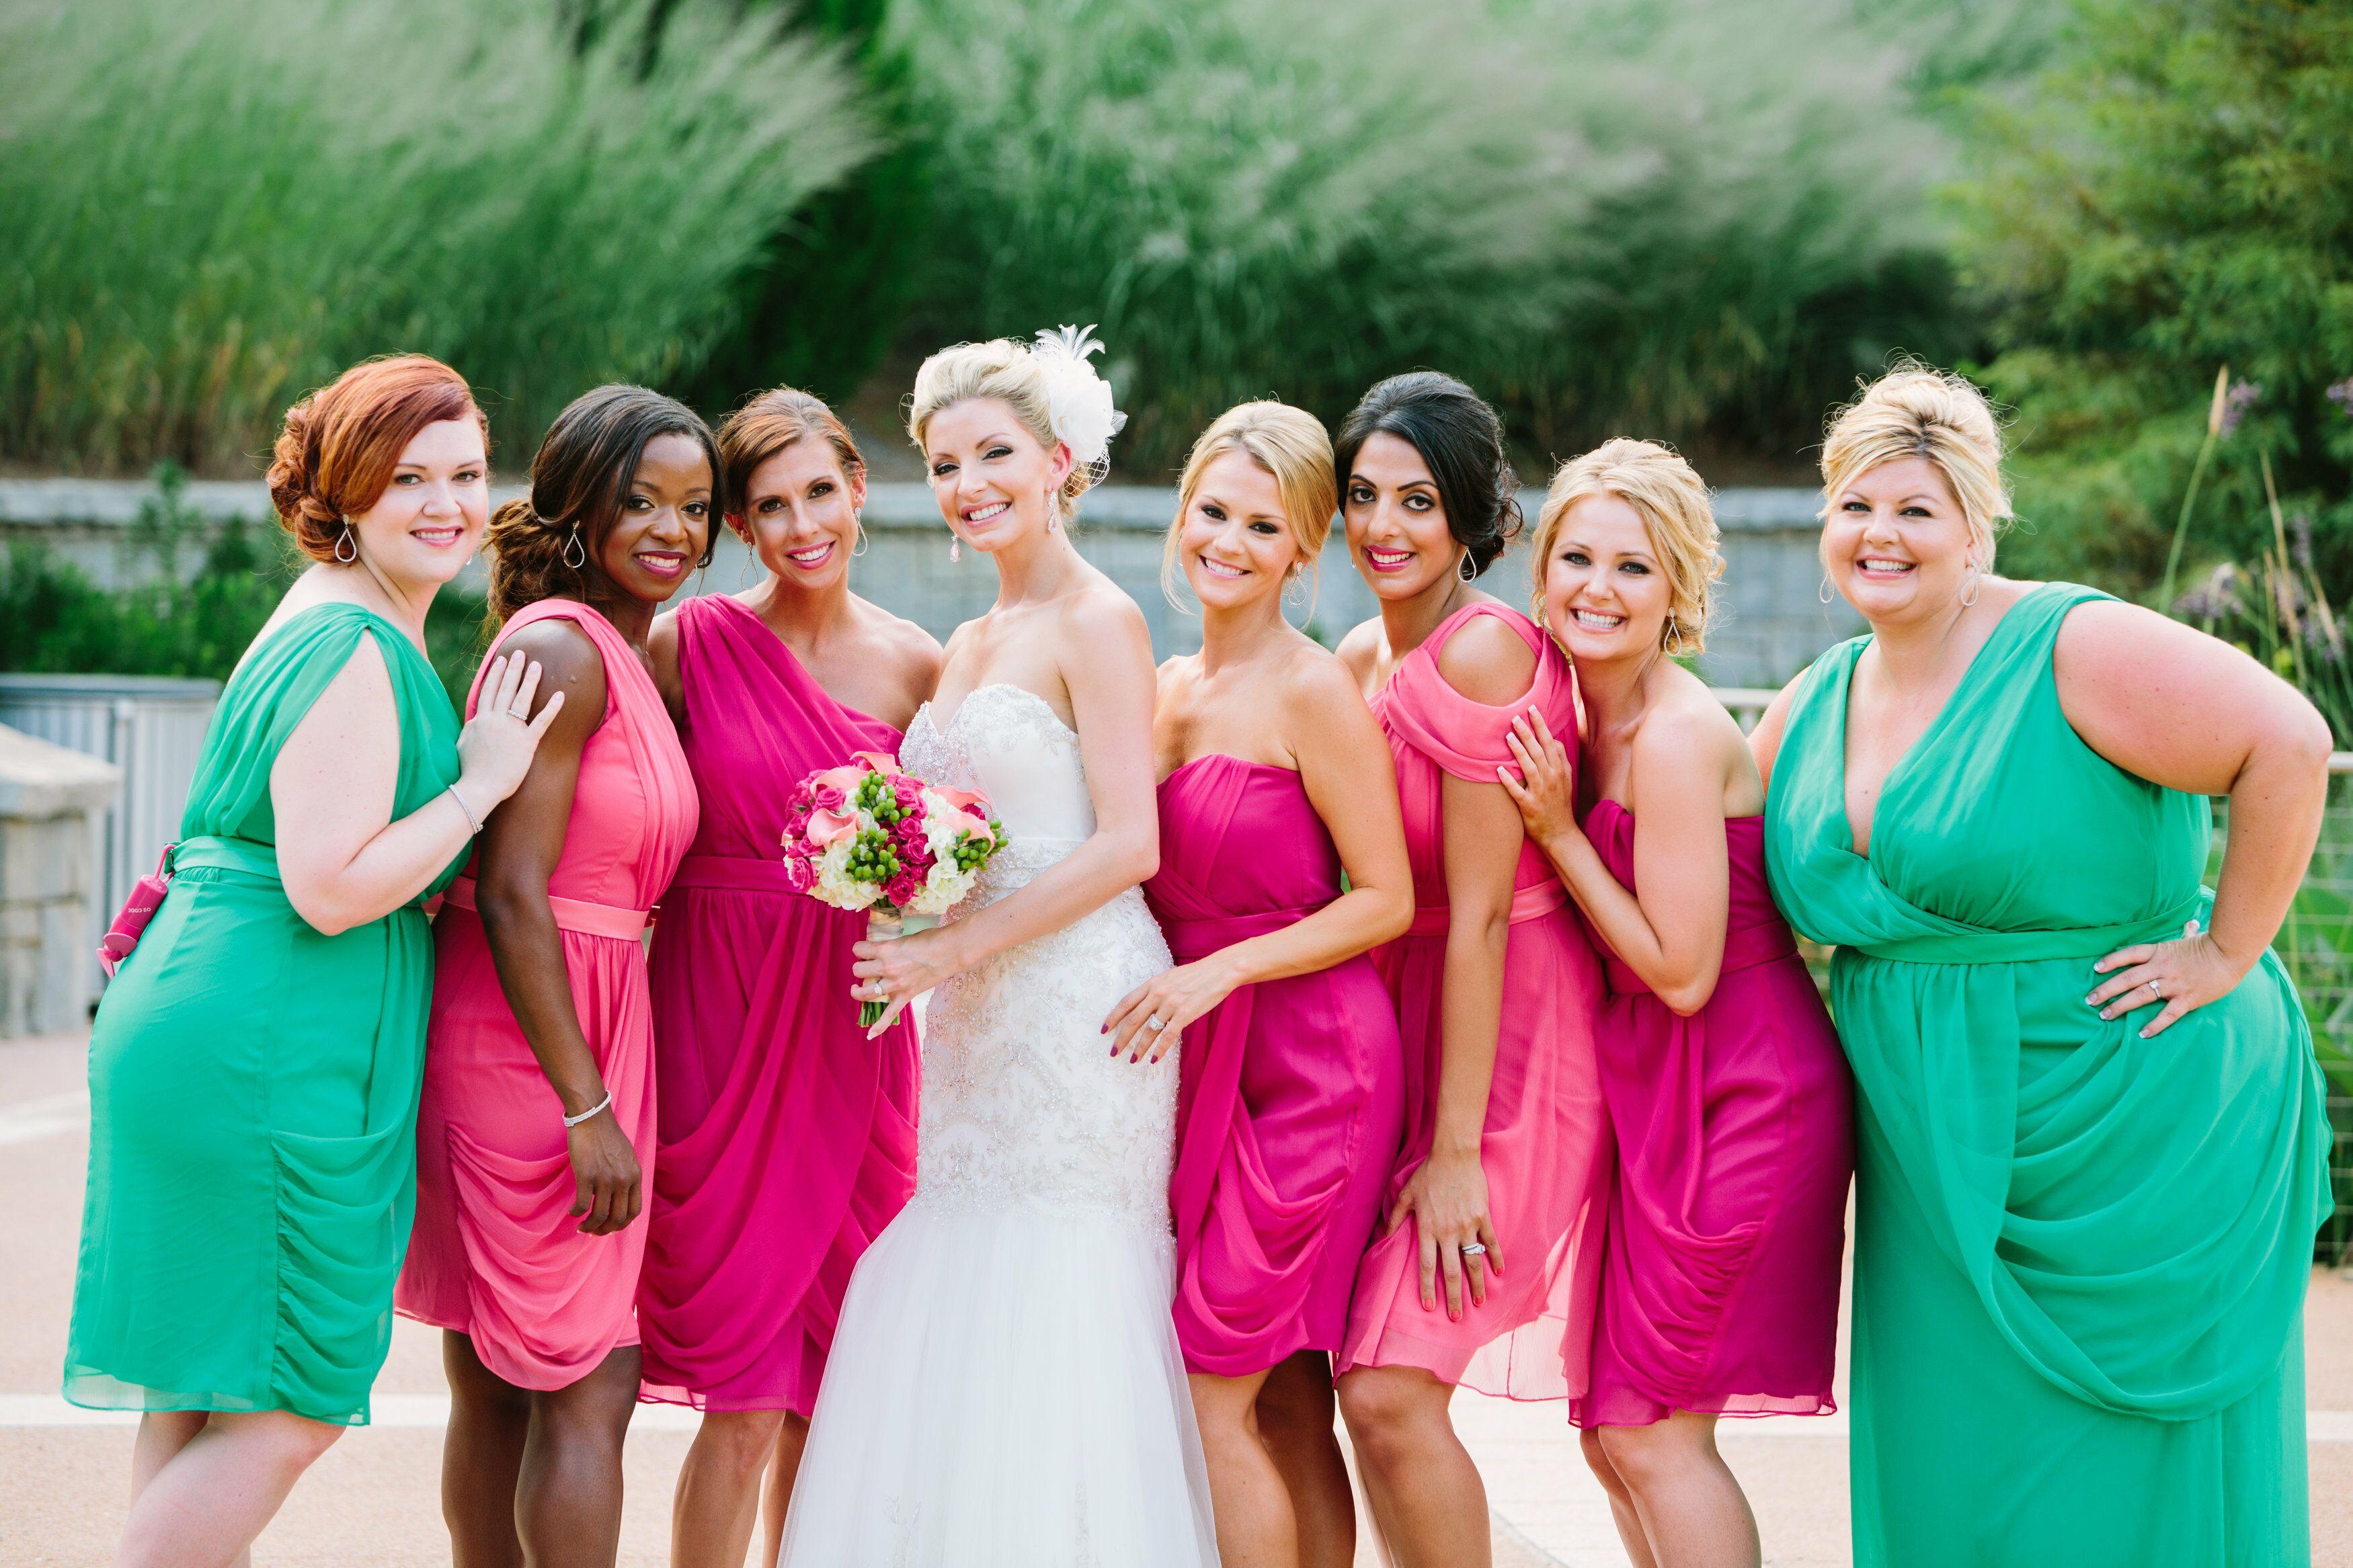 Colorful Mixed Pink And Green Bridesmaid Dresses